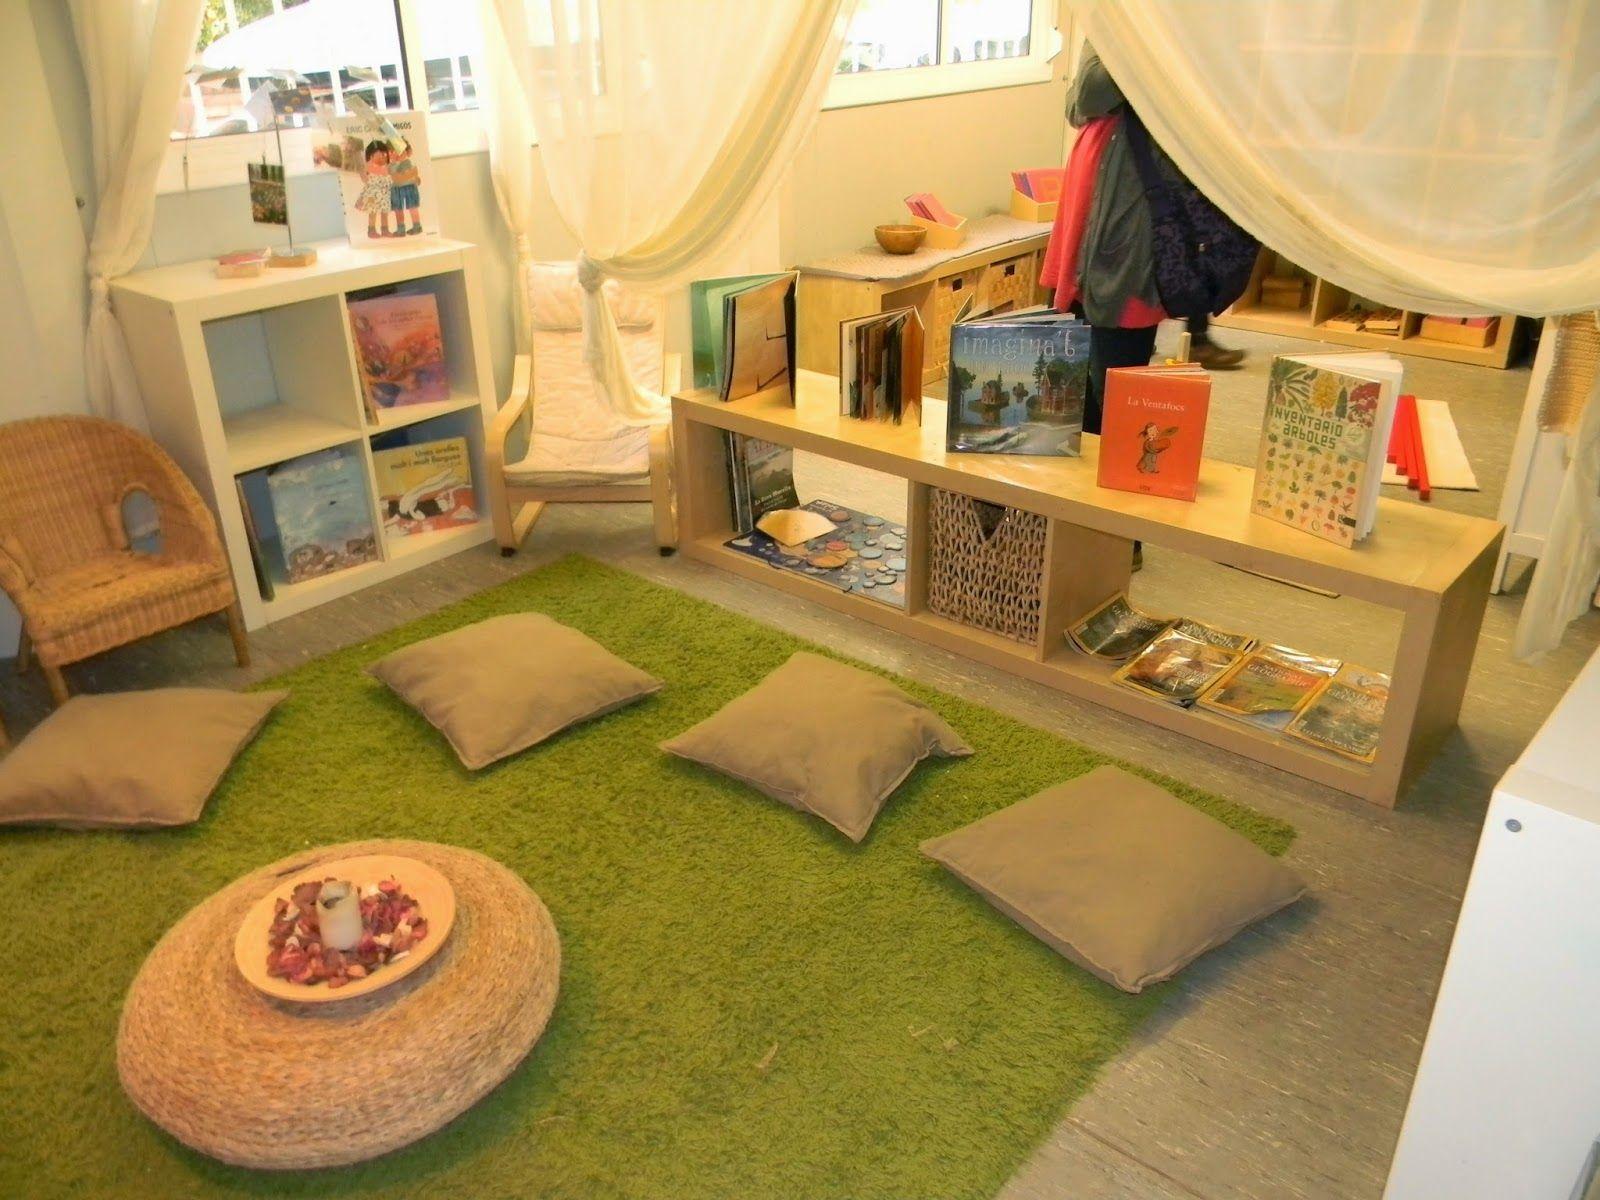 Klassenzimmergestaltung grundschule leseecke for Raumgestaltung kita 3 6